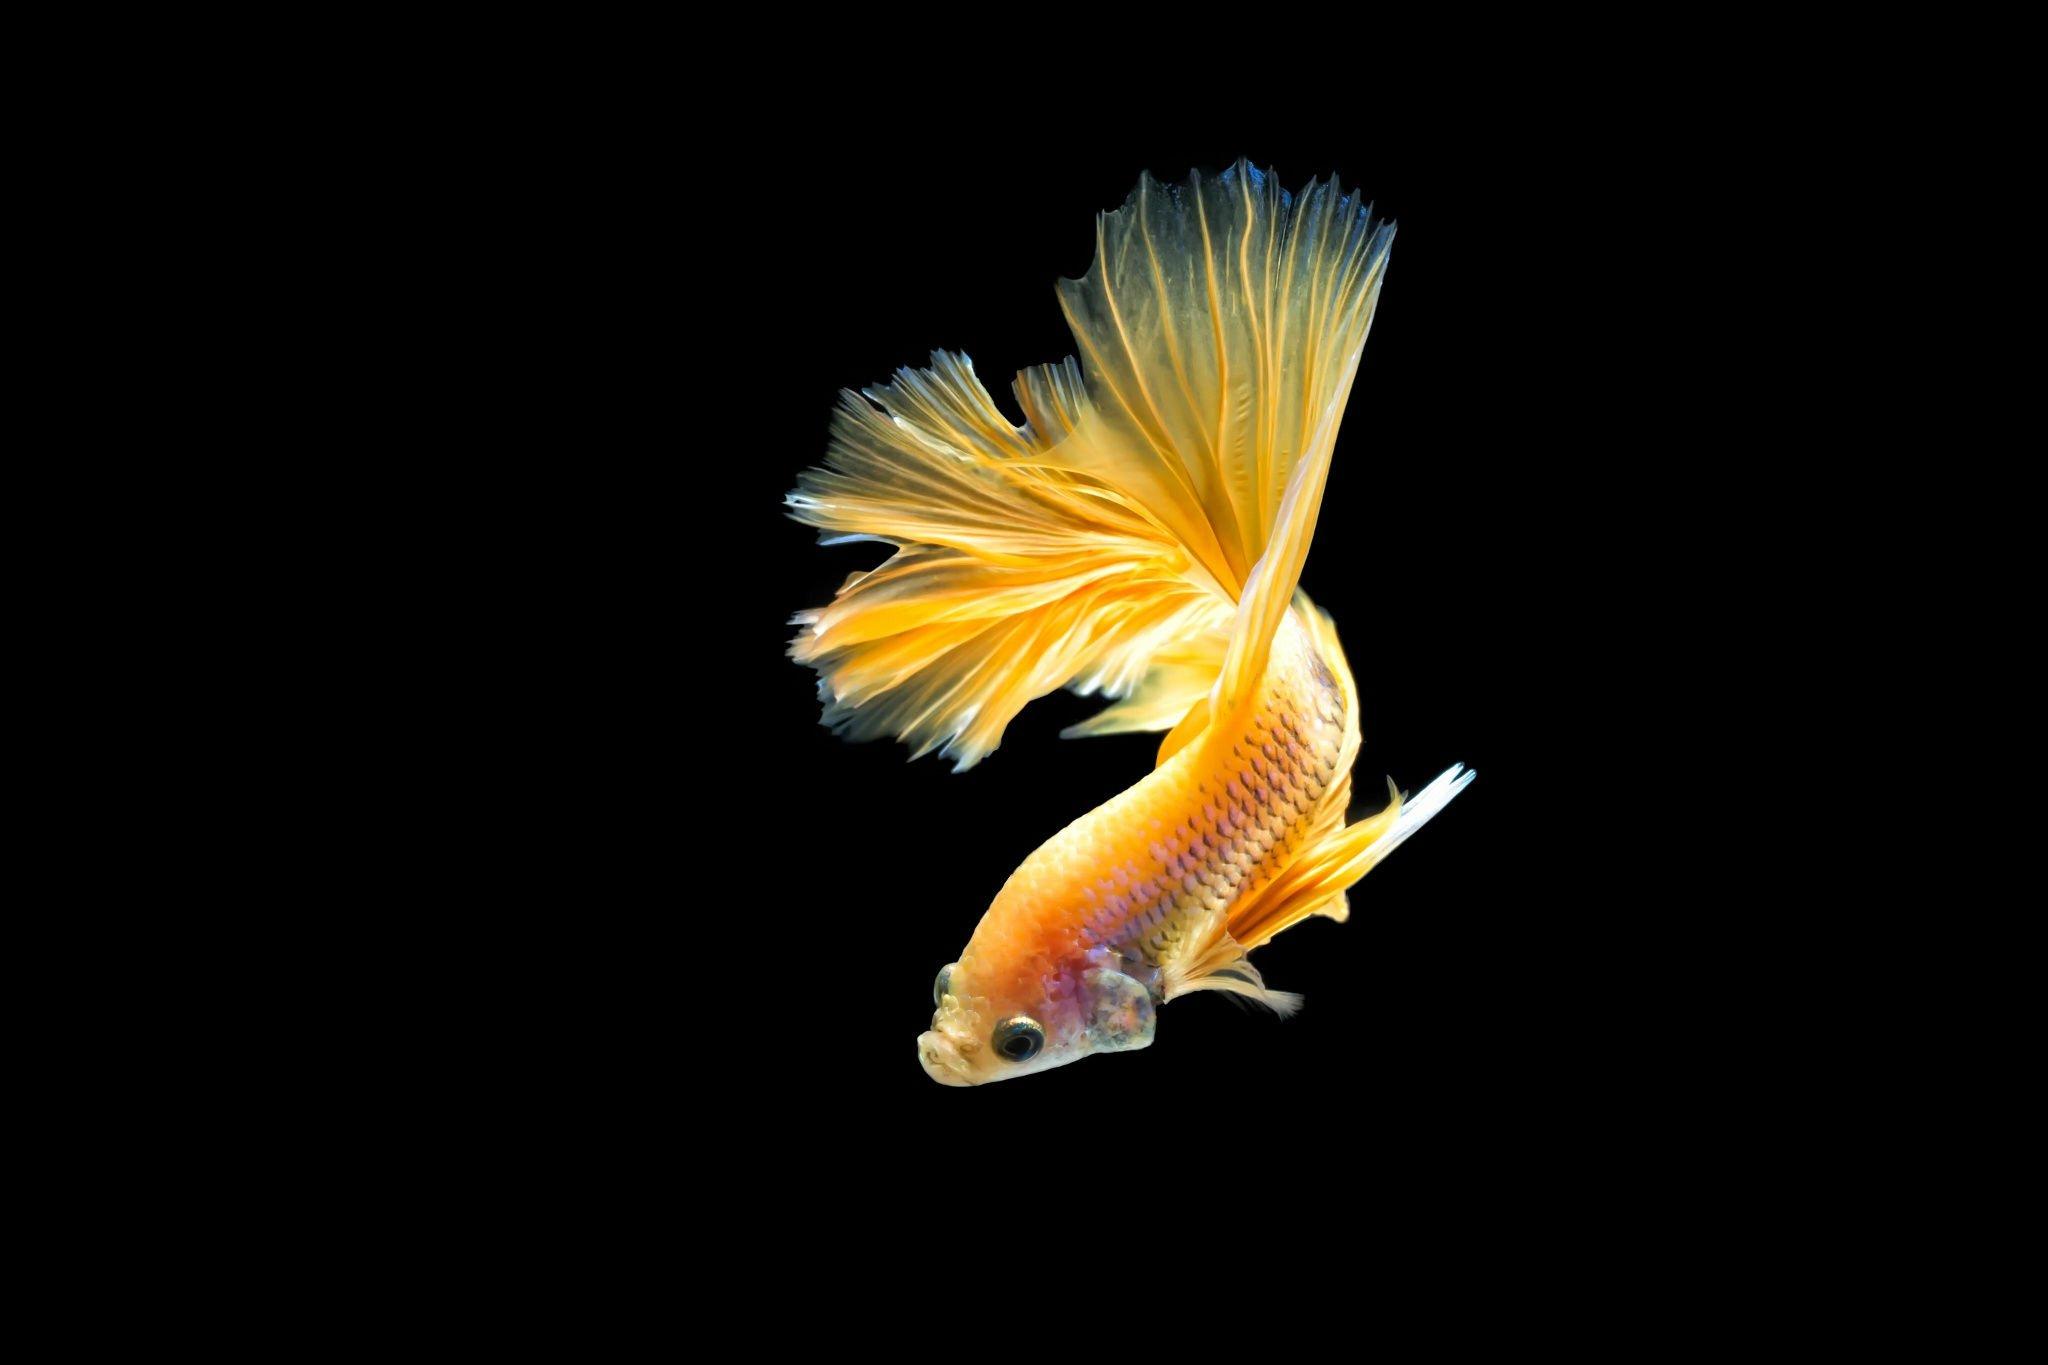 Underwater Iphone Wallpaper Betta Siamese Fighting Fish Underwater Tropical